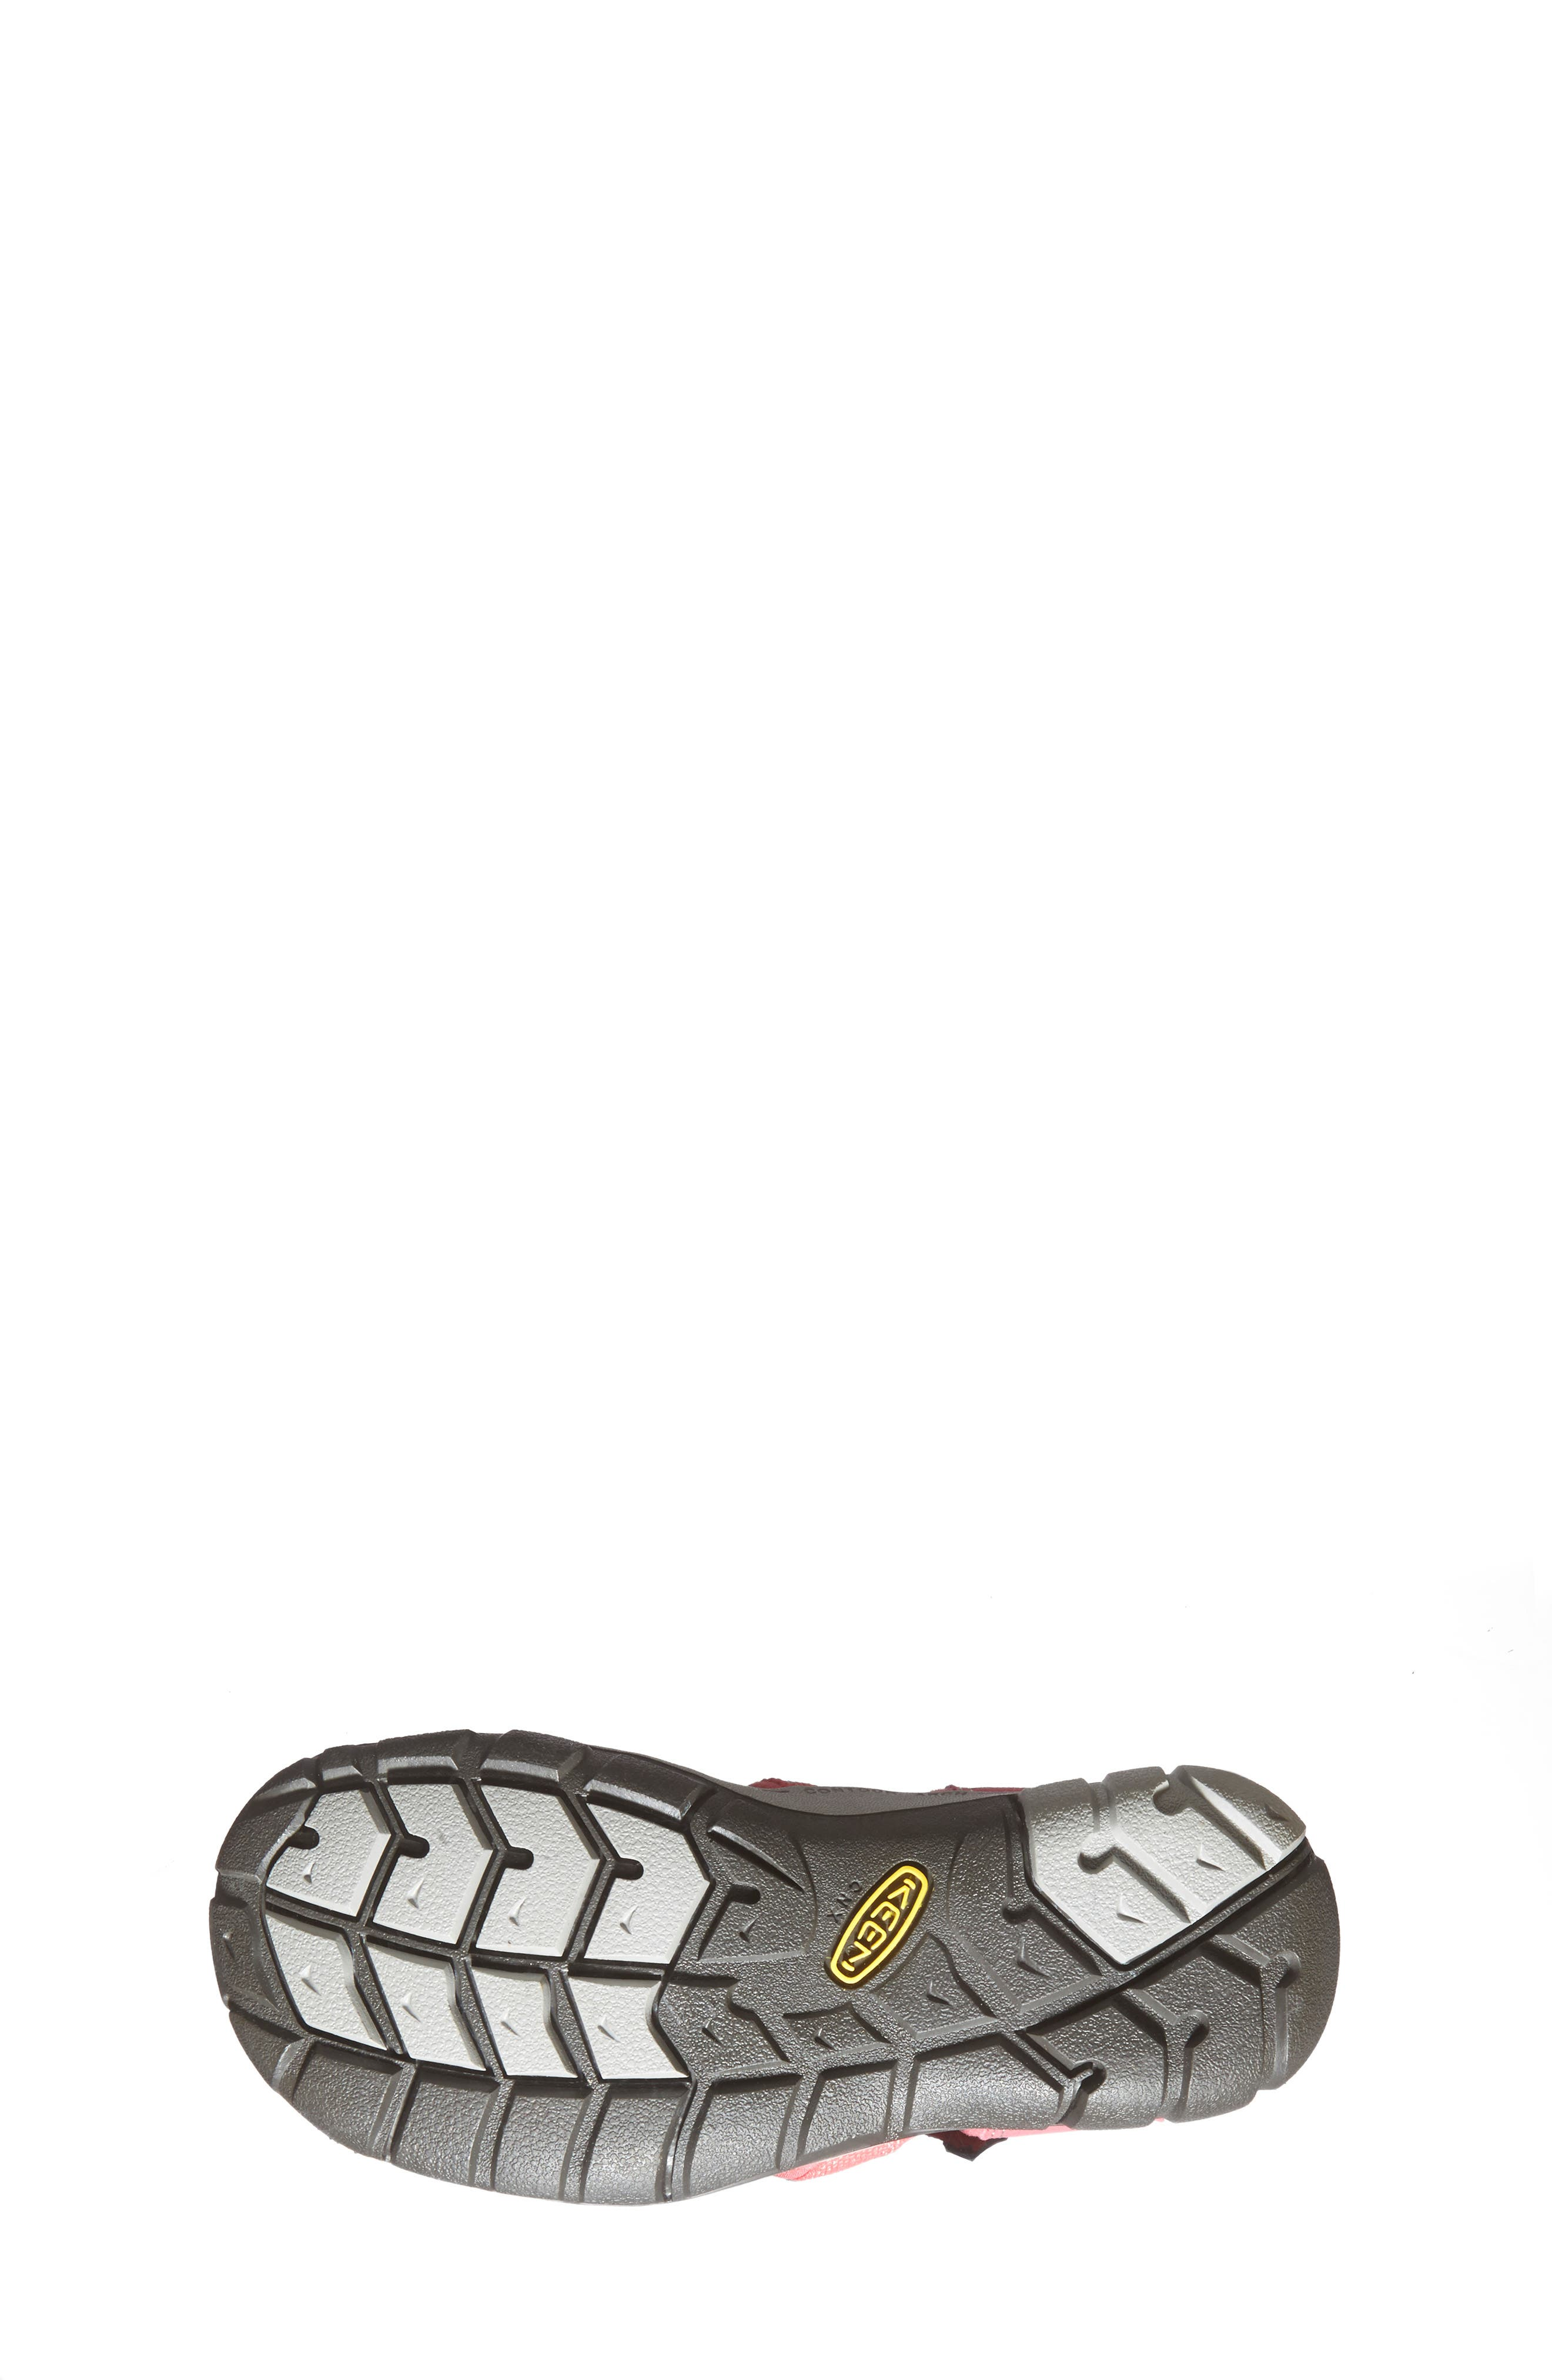 ,                             'Seacamp II' Water Friendly Sandal,                             Alternate thumbnail 251, color,                             650